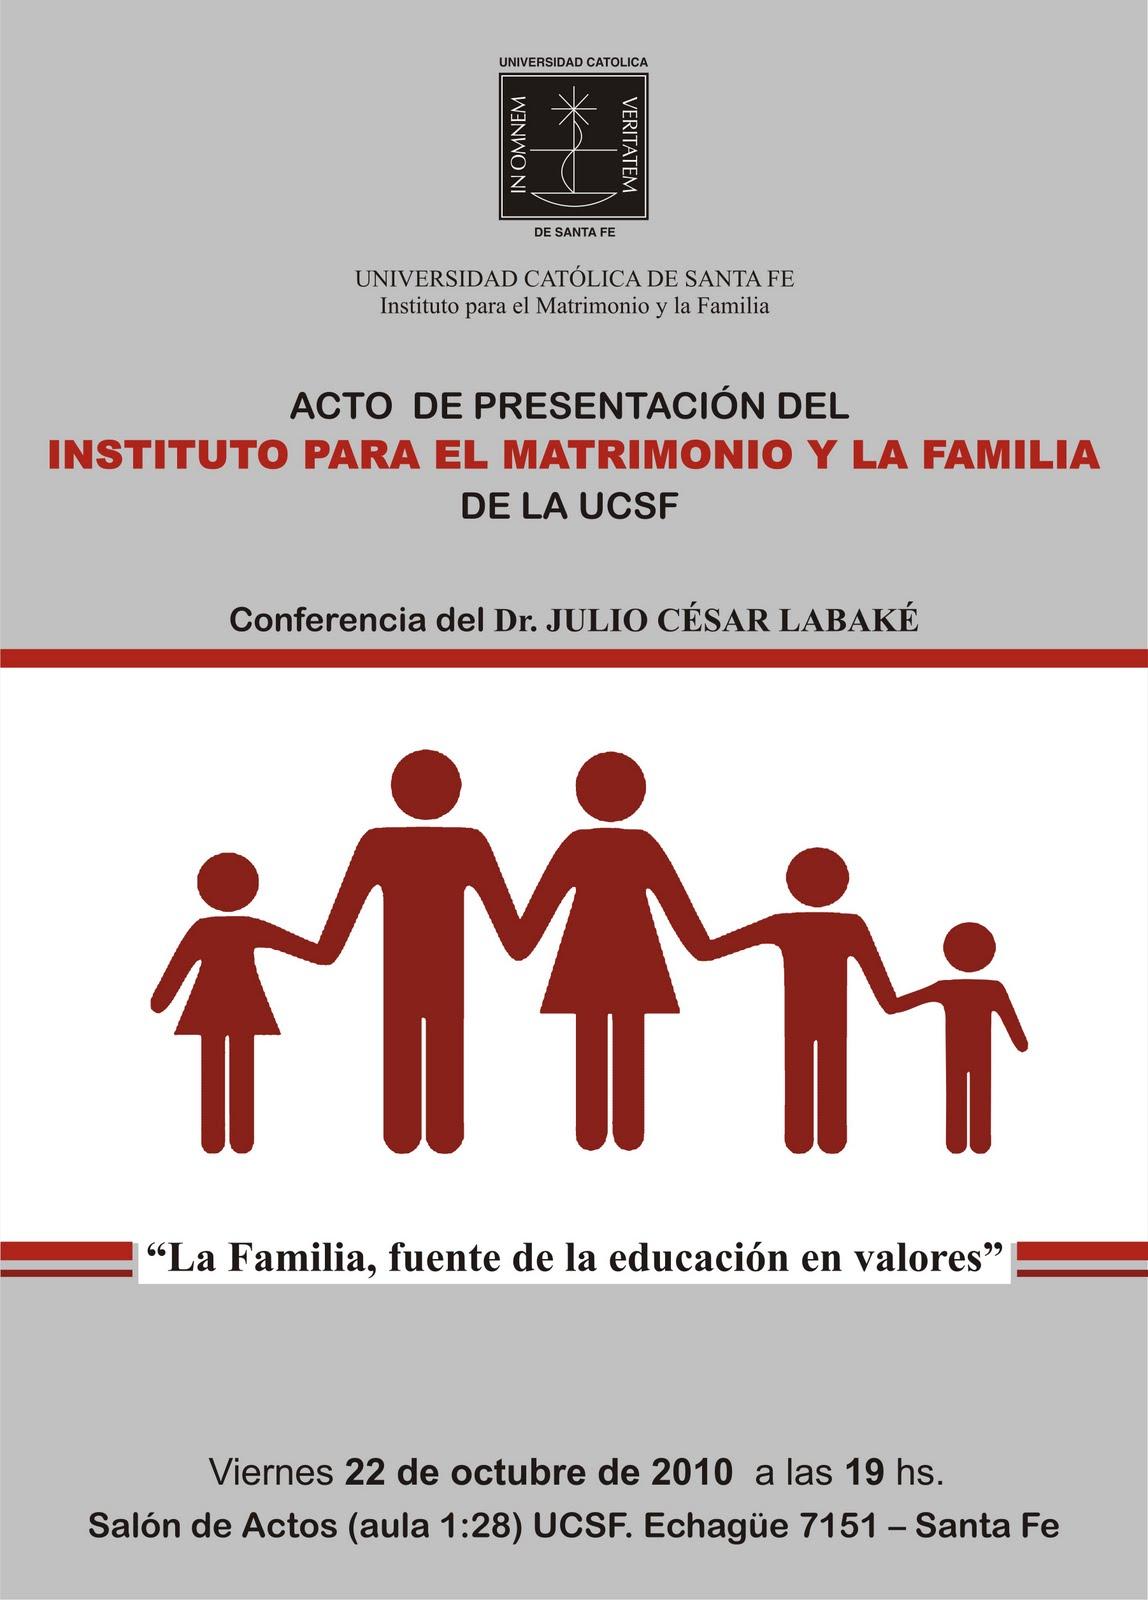 Matrimonio Universidad Catolica : Nuevo instituto para el matrimonio y la familia en ucsf